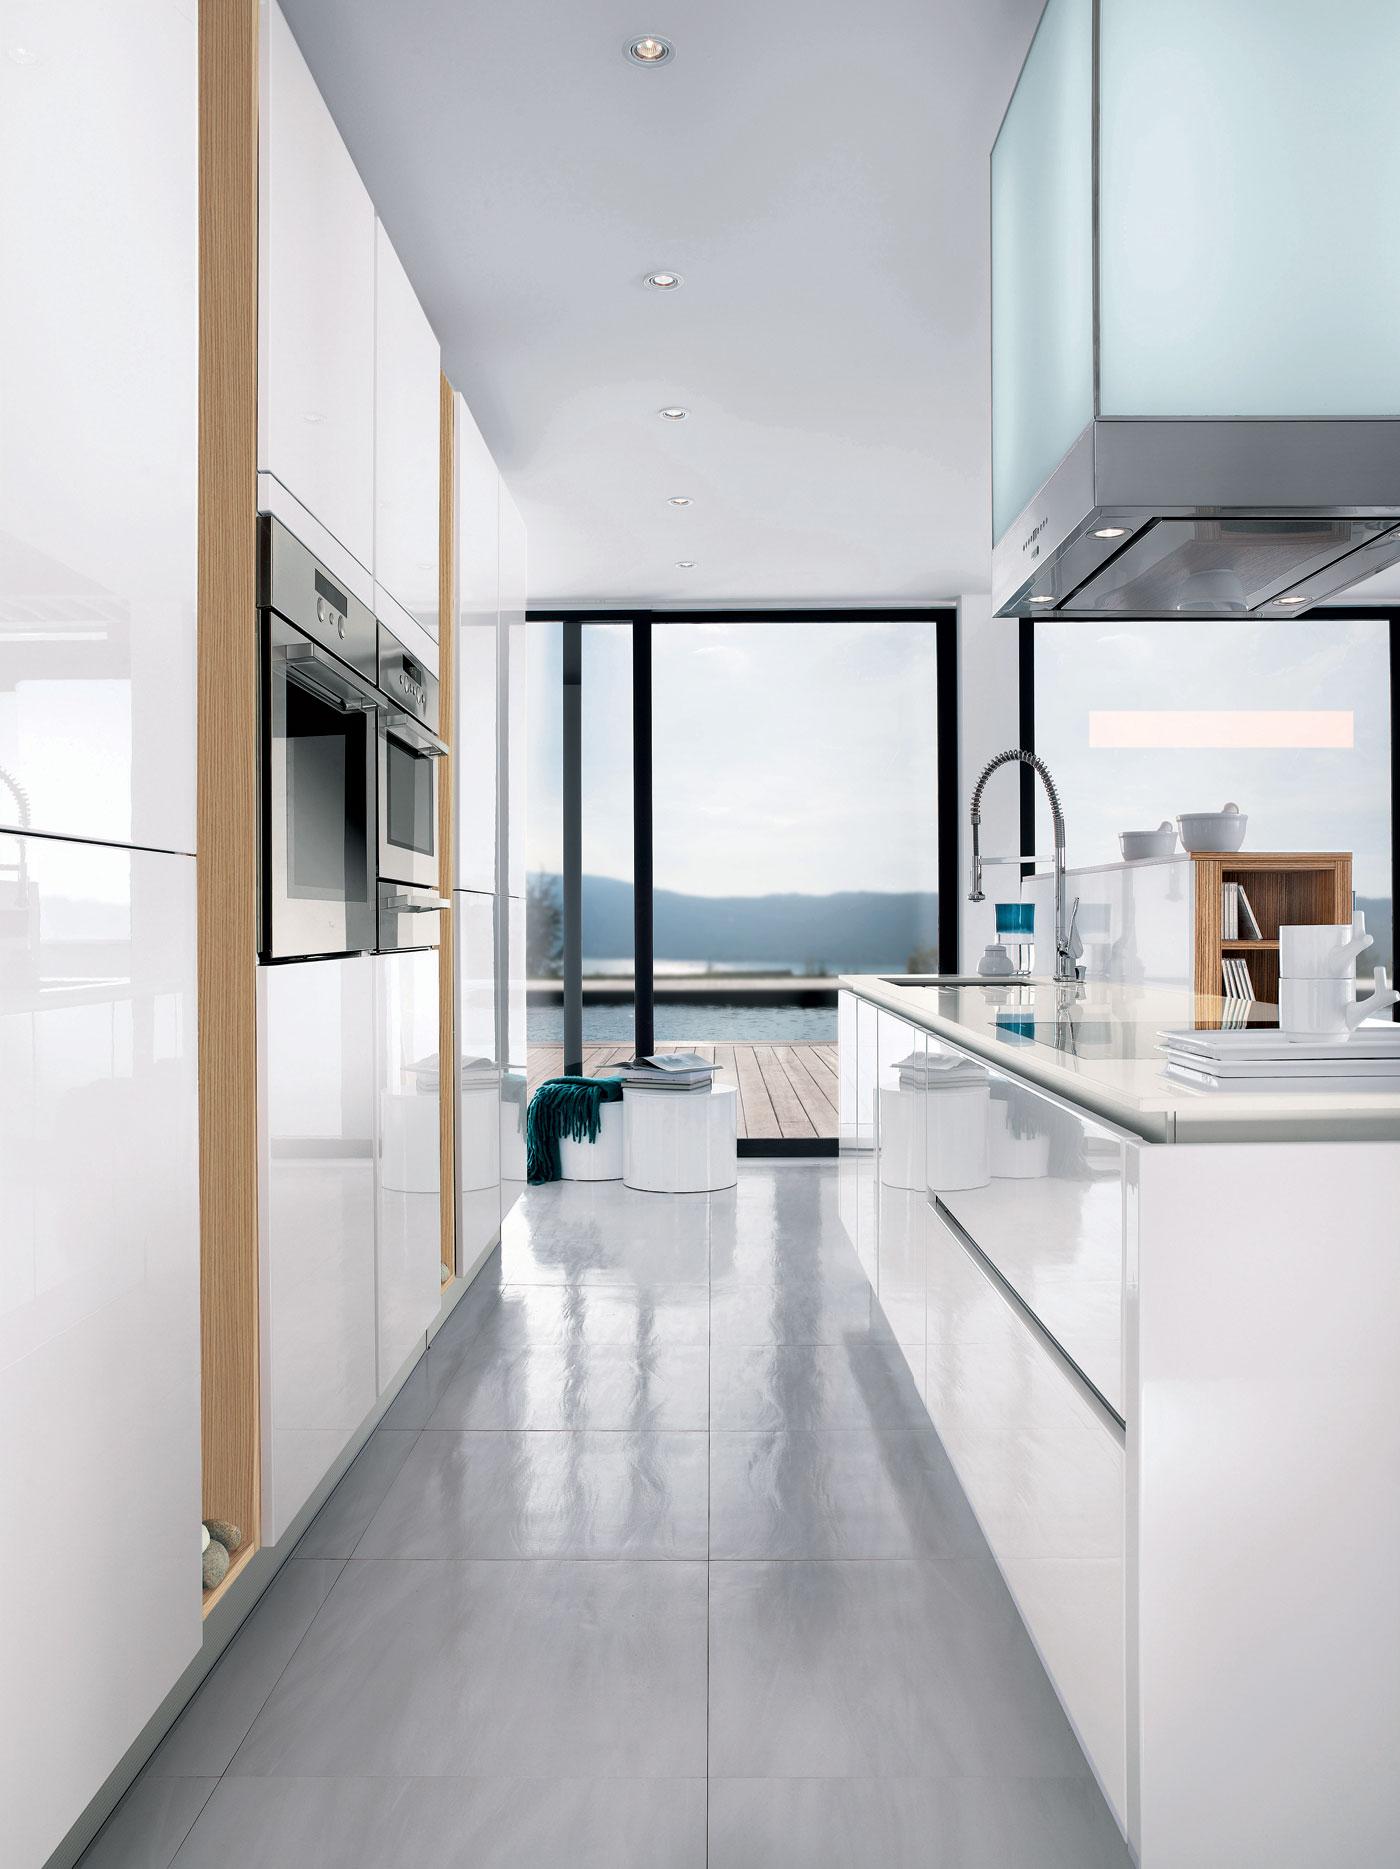 cuisine l500 laqu blanc brillant m100h m lamin ch ne blanchi satin perene lyon. Black Bedroom Furniture Sets. Home Design Ideas